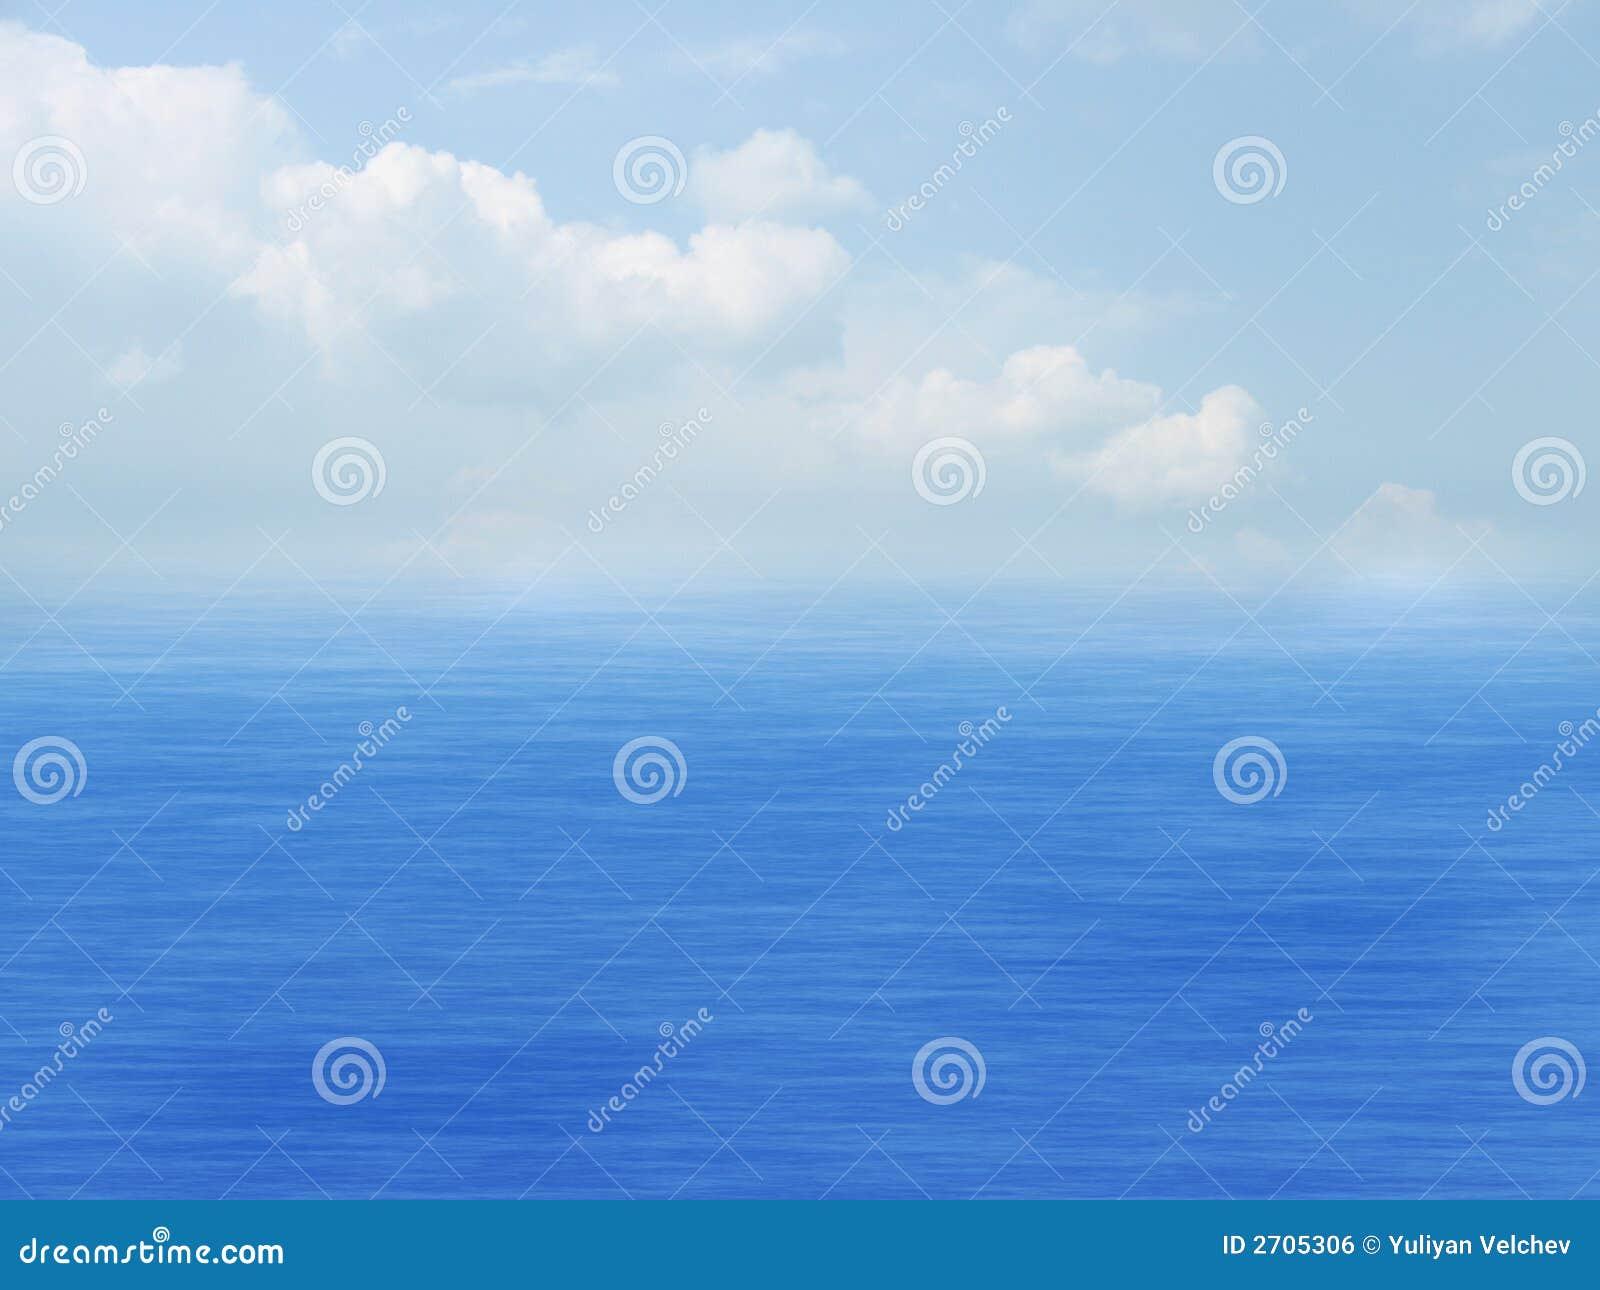 Sea, sky and clouds